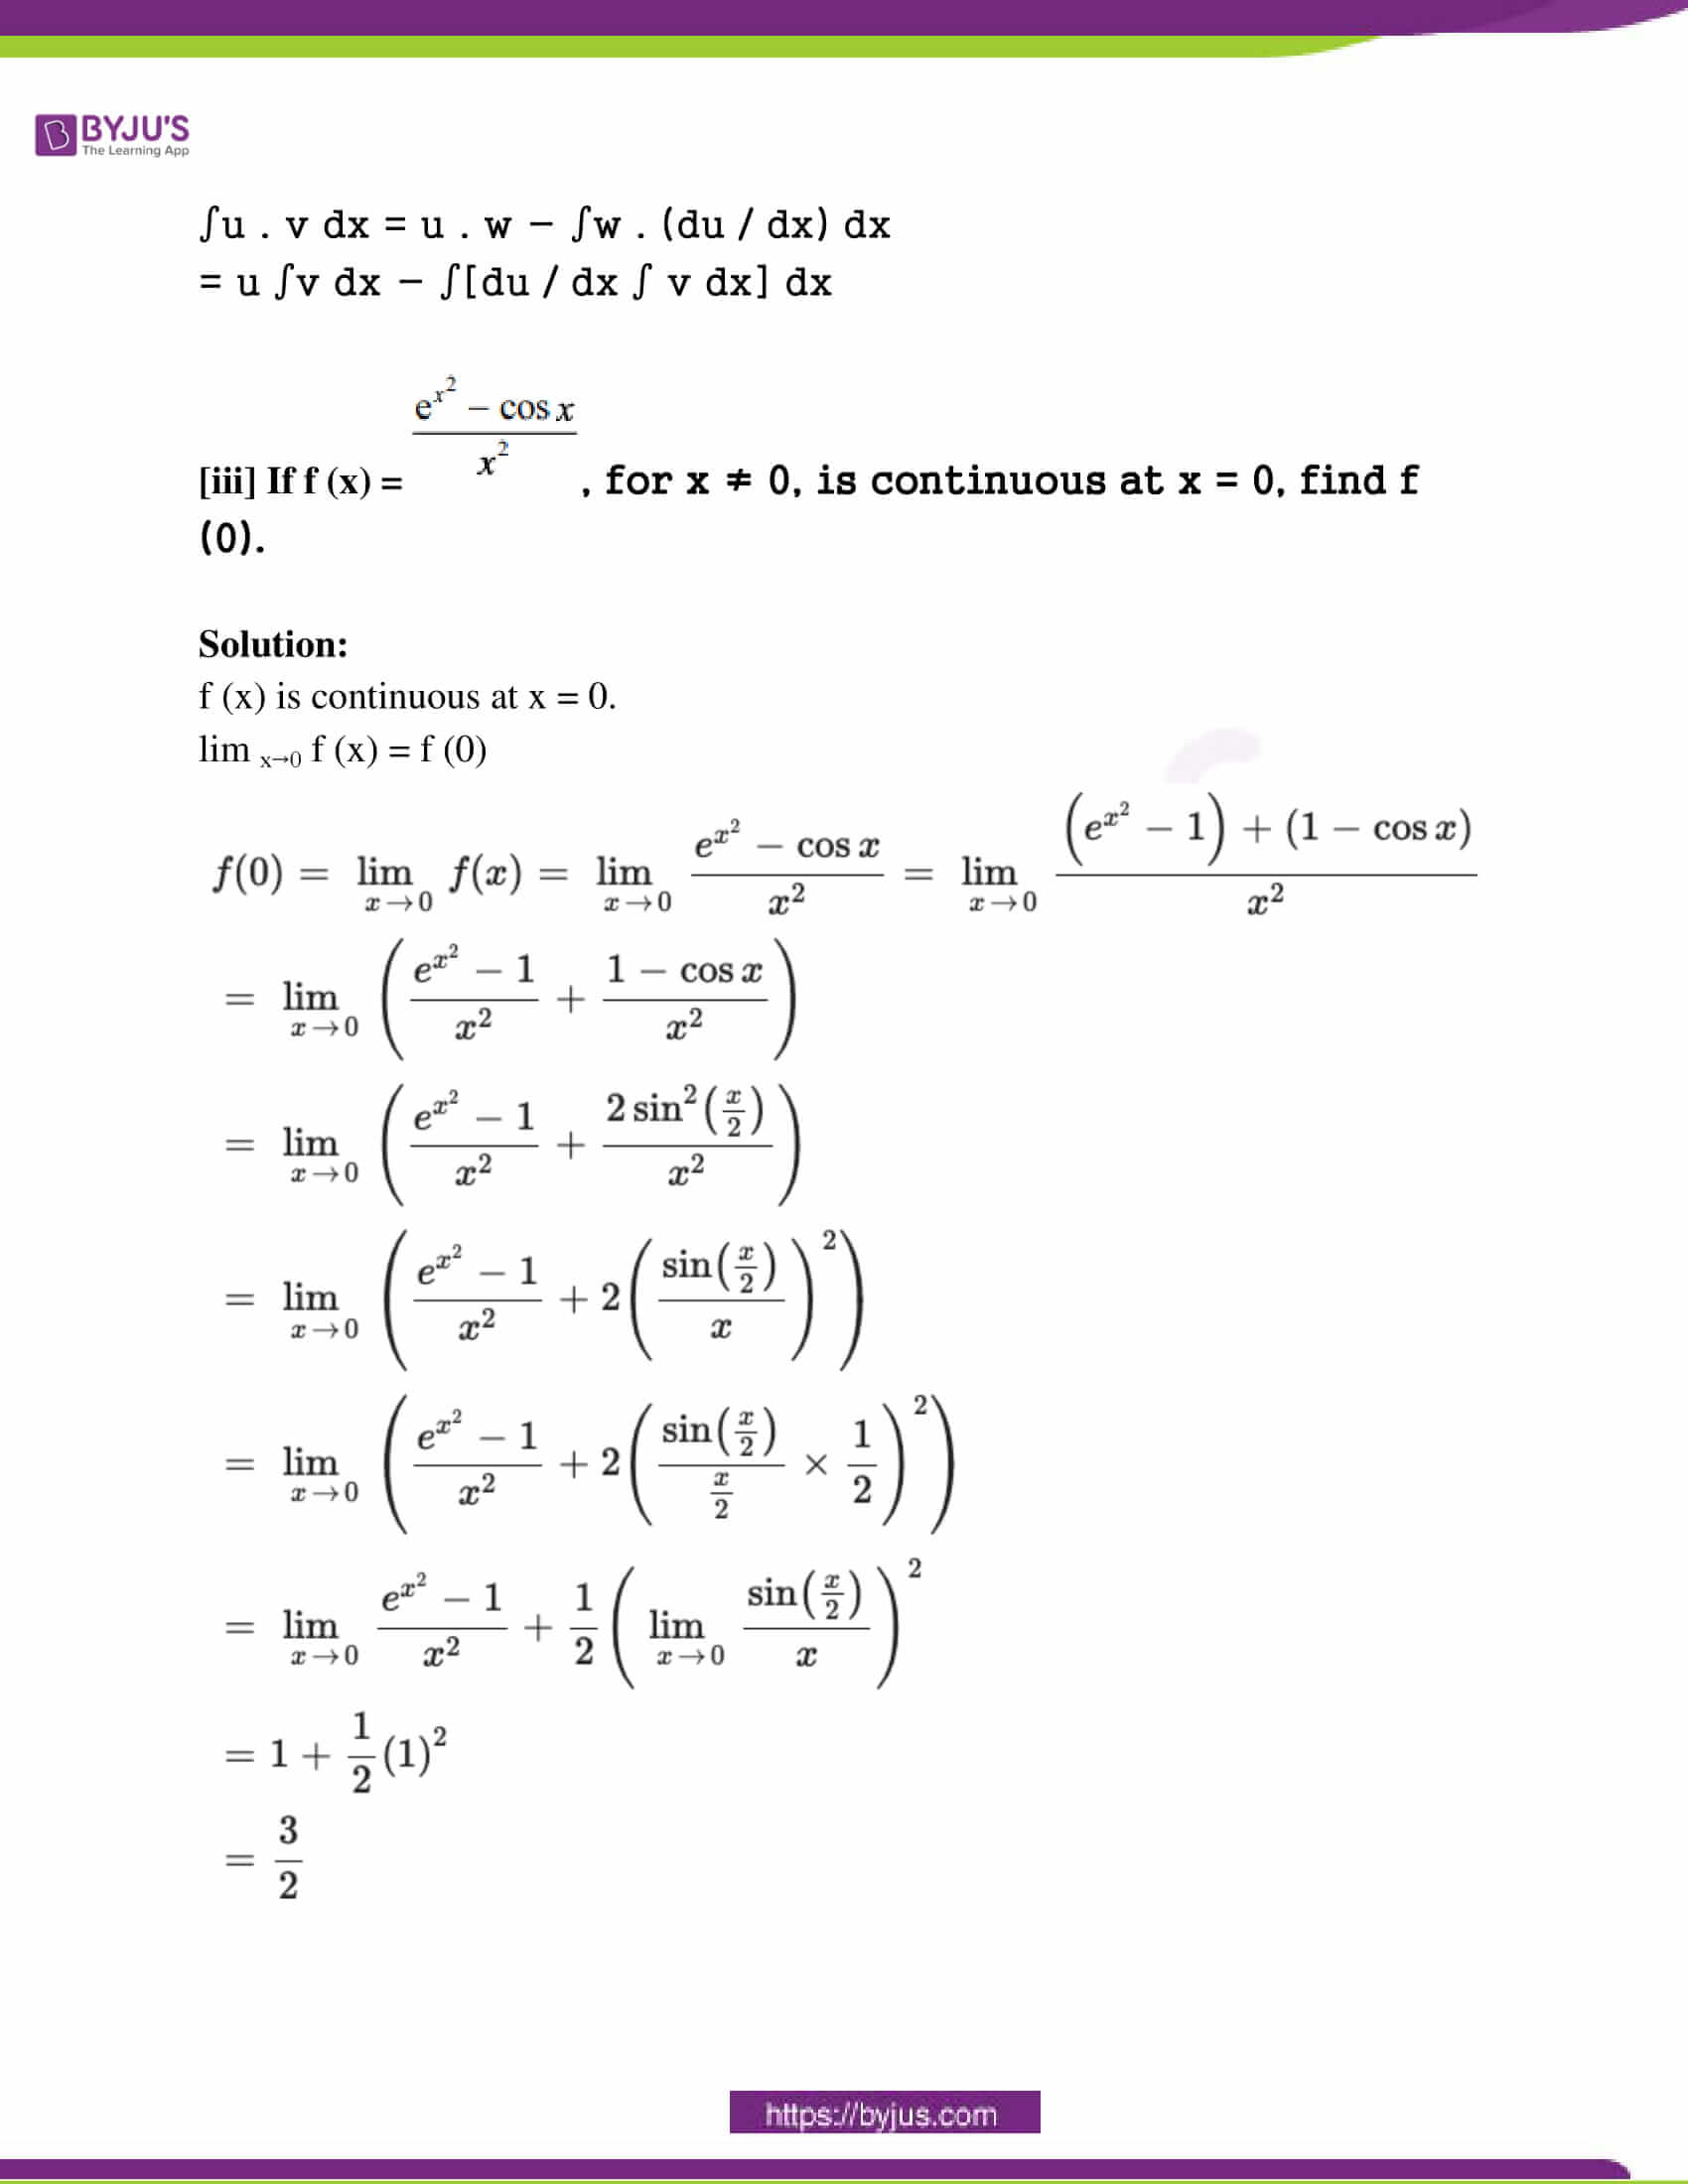 maharashtra class 12 exam question paper solutions march 2017 19